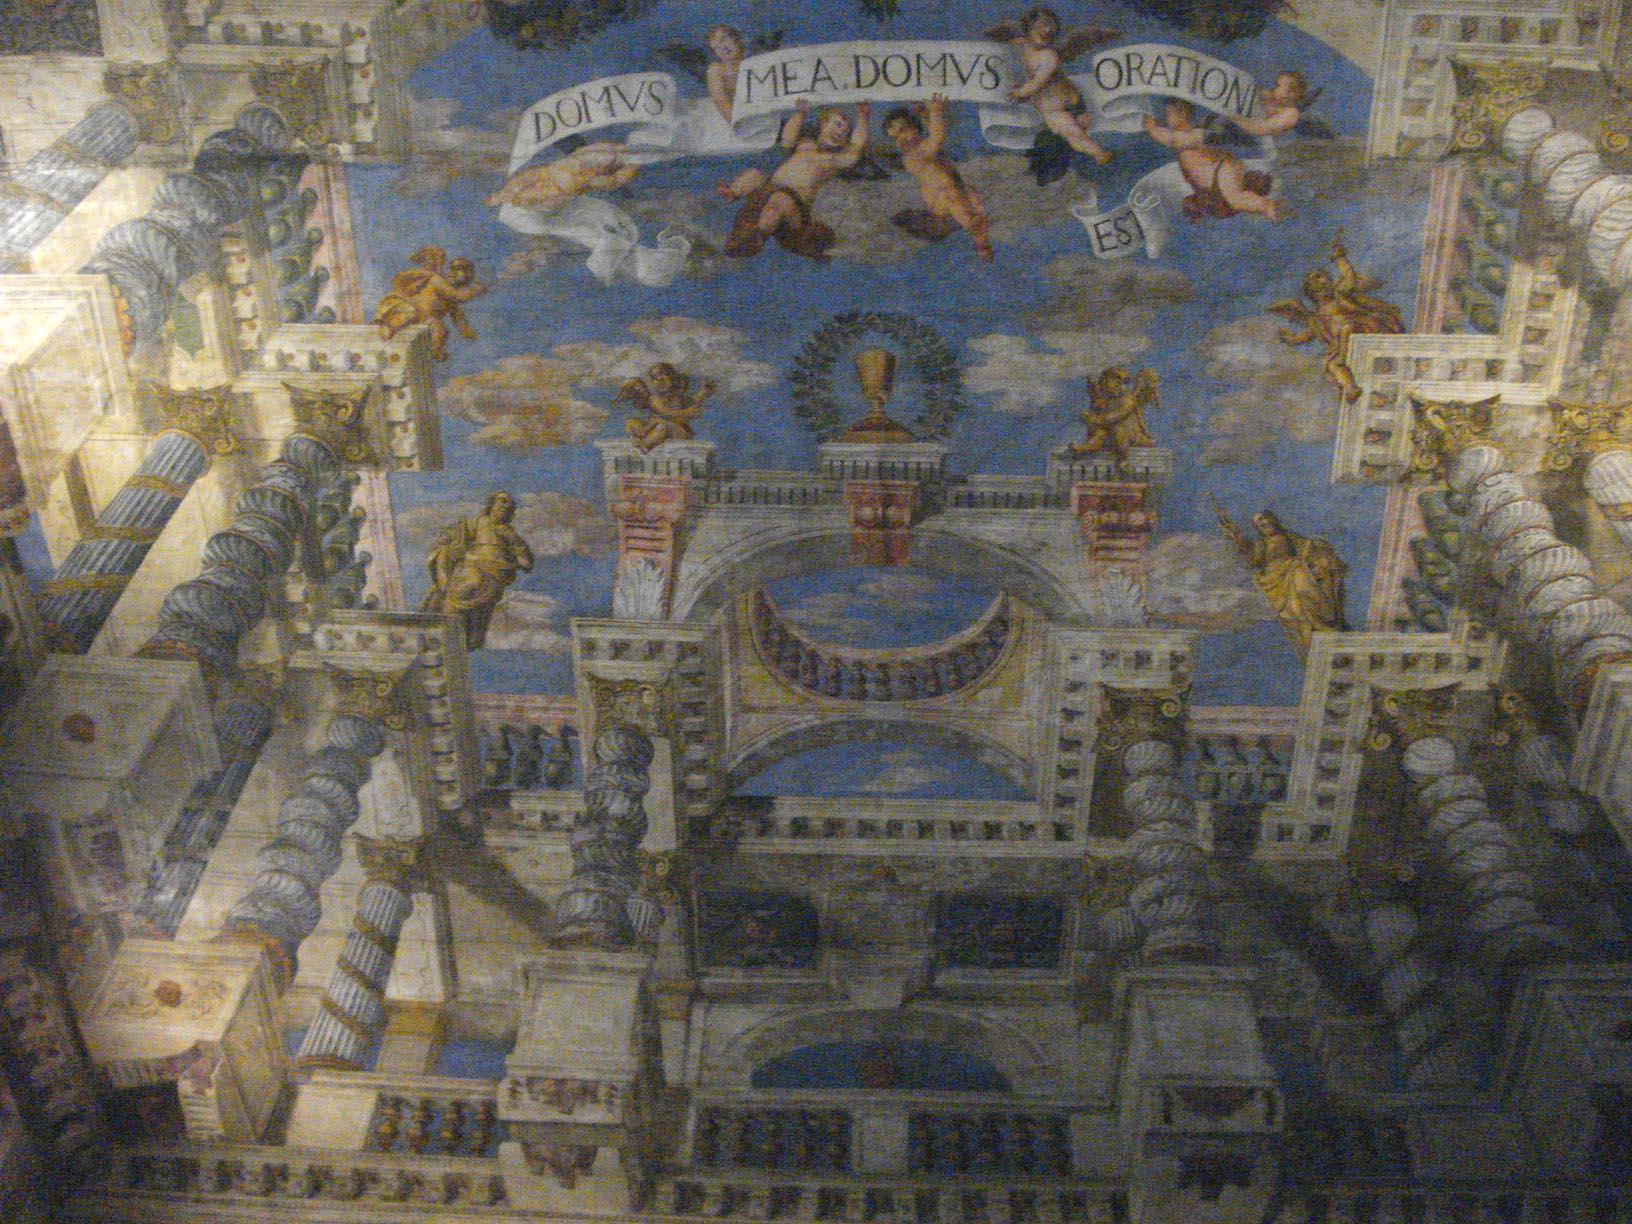 033-ложная перспектива потолка